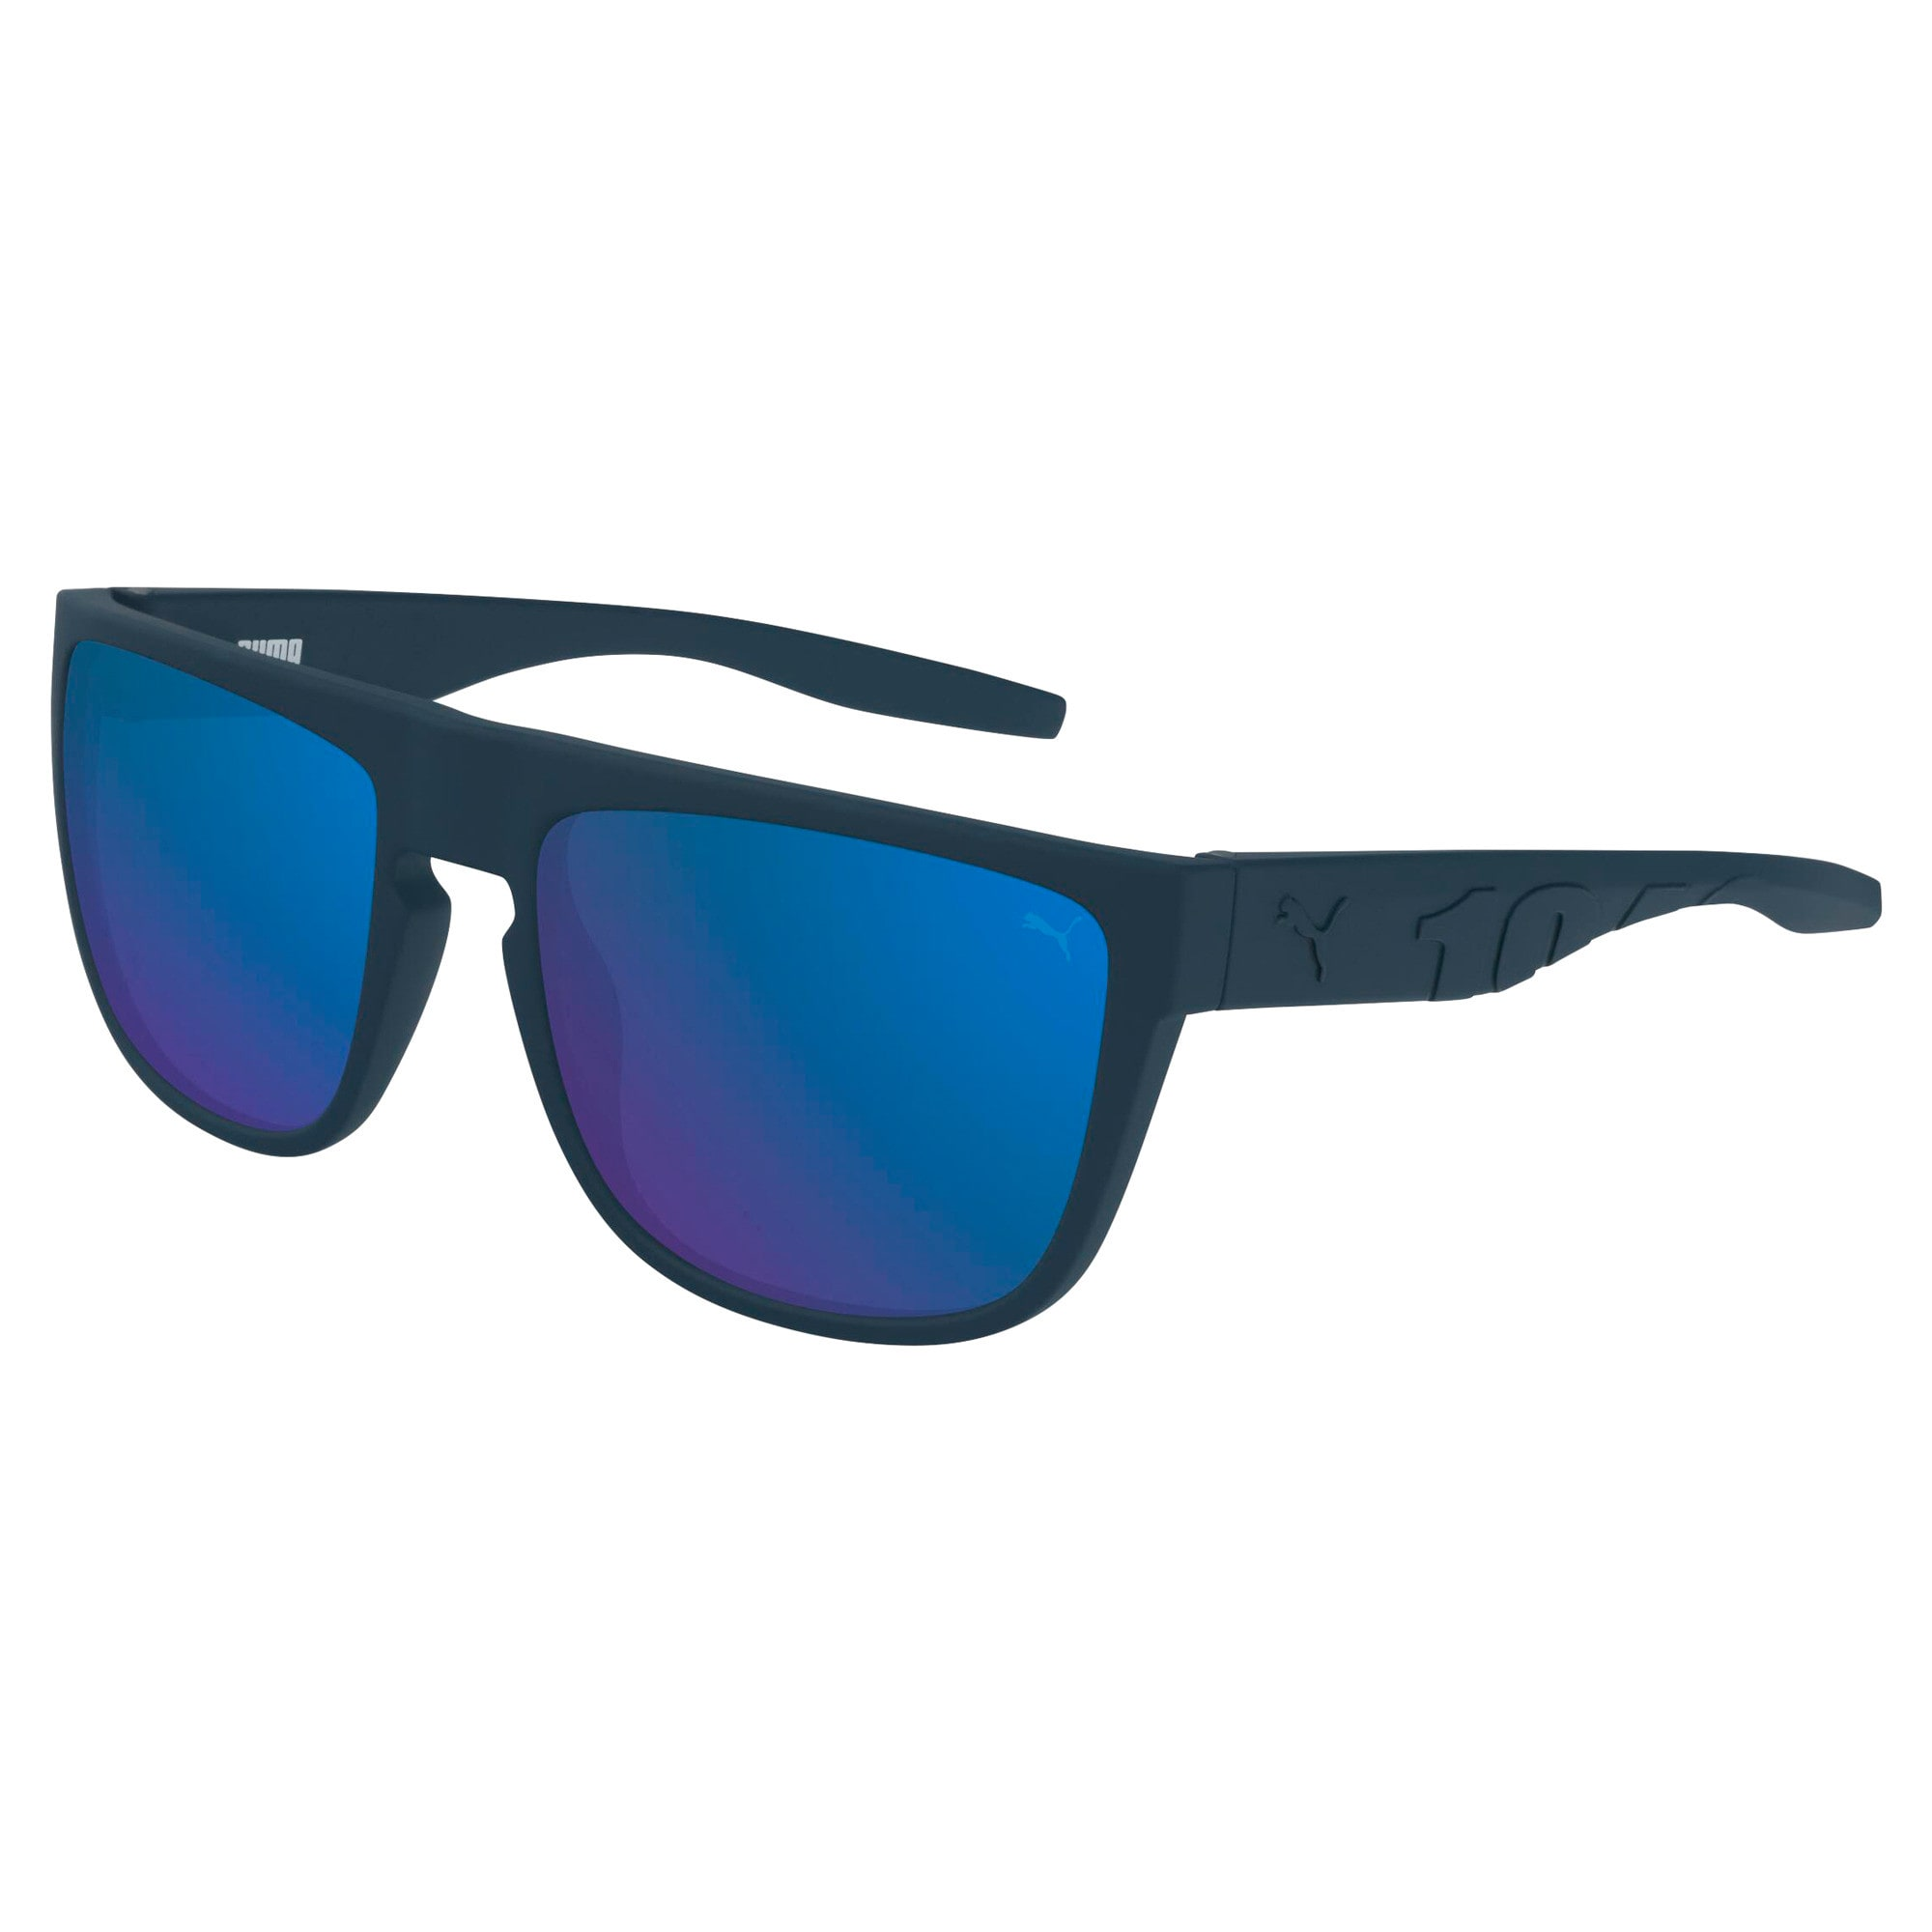 Thumbnail 1 of Men's Sunglasses, BLUE-BLUE-RED, medium